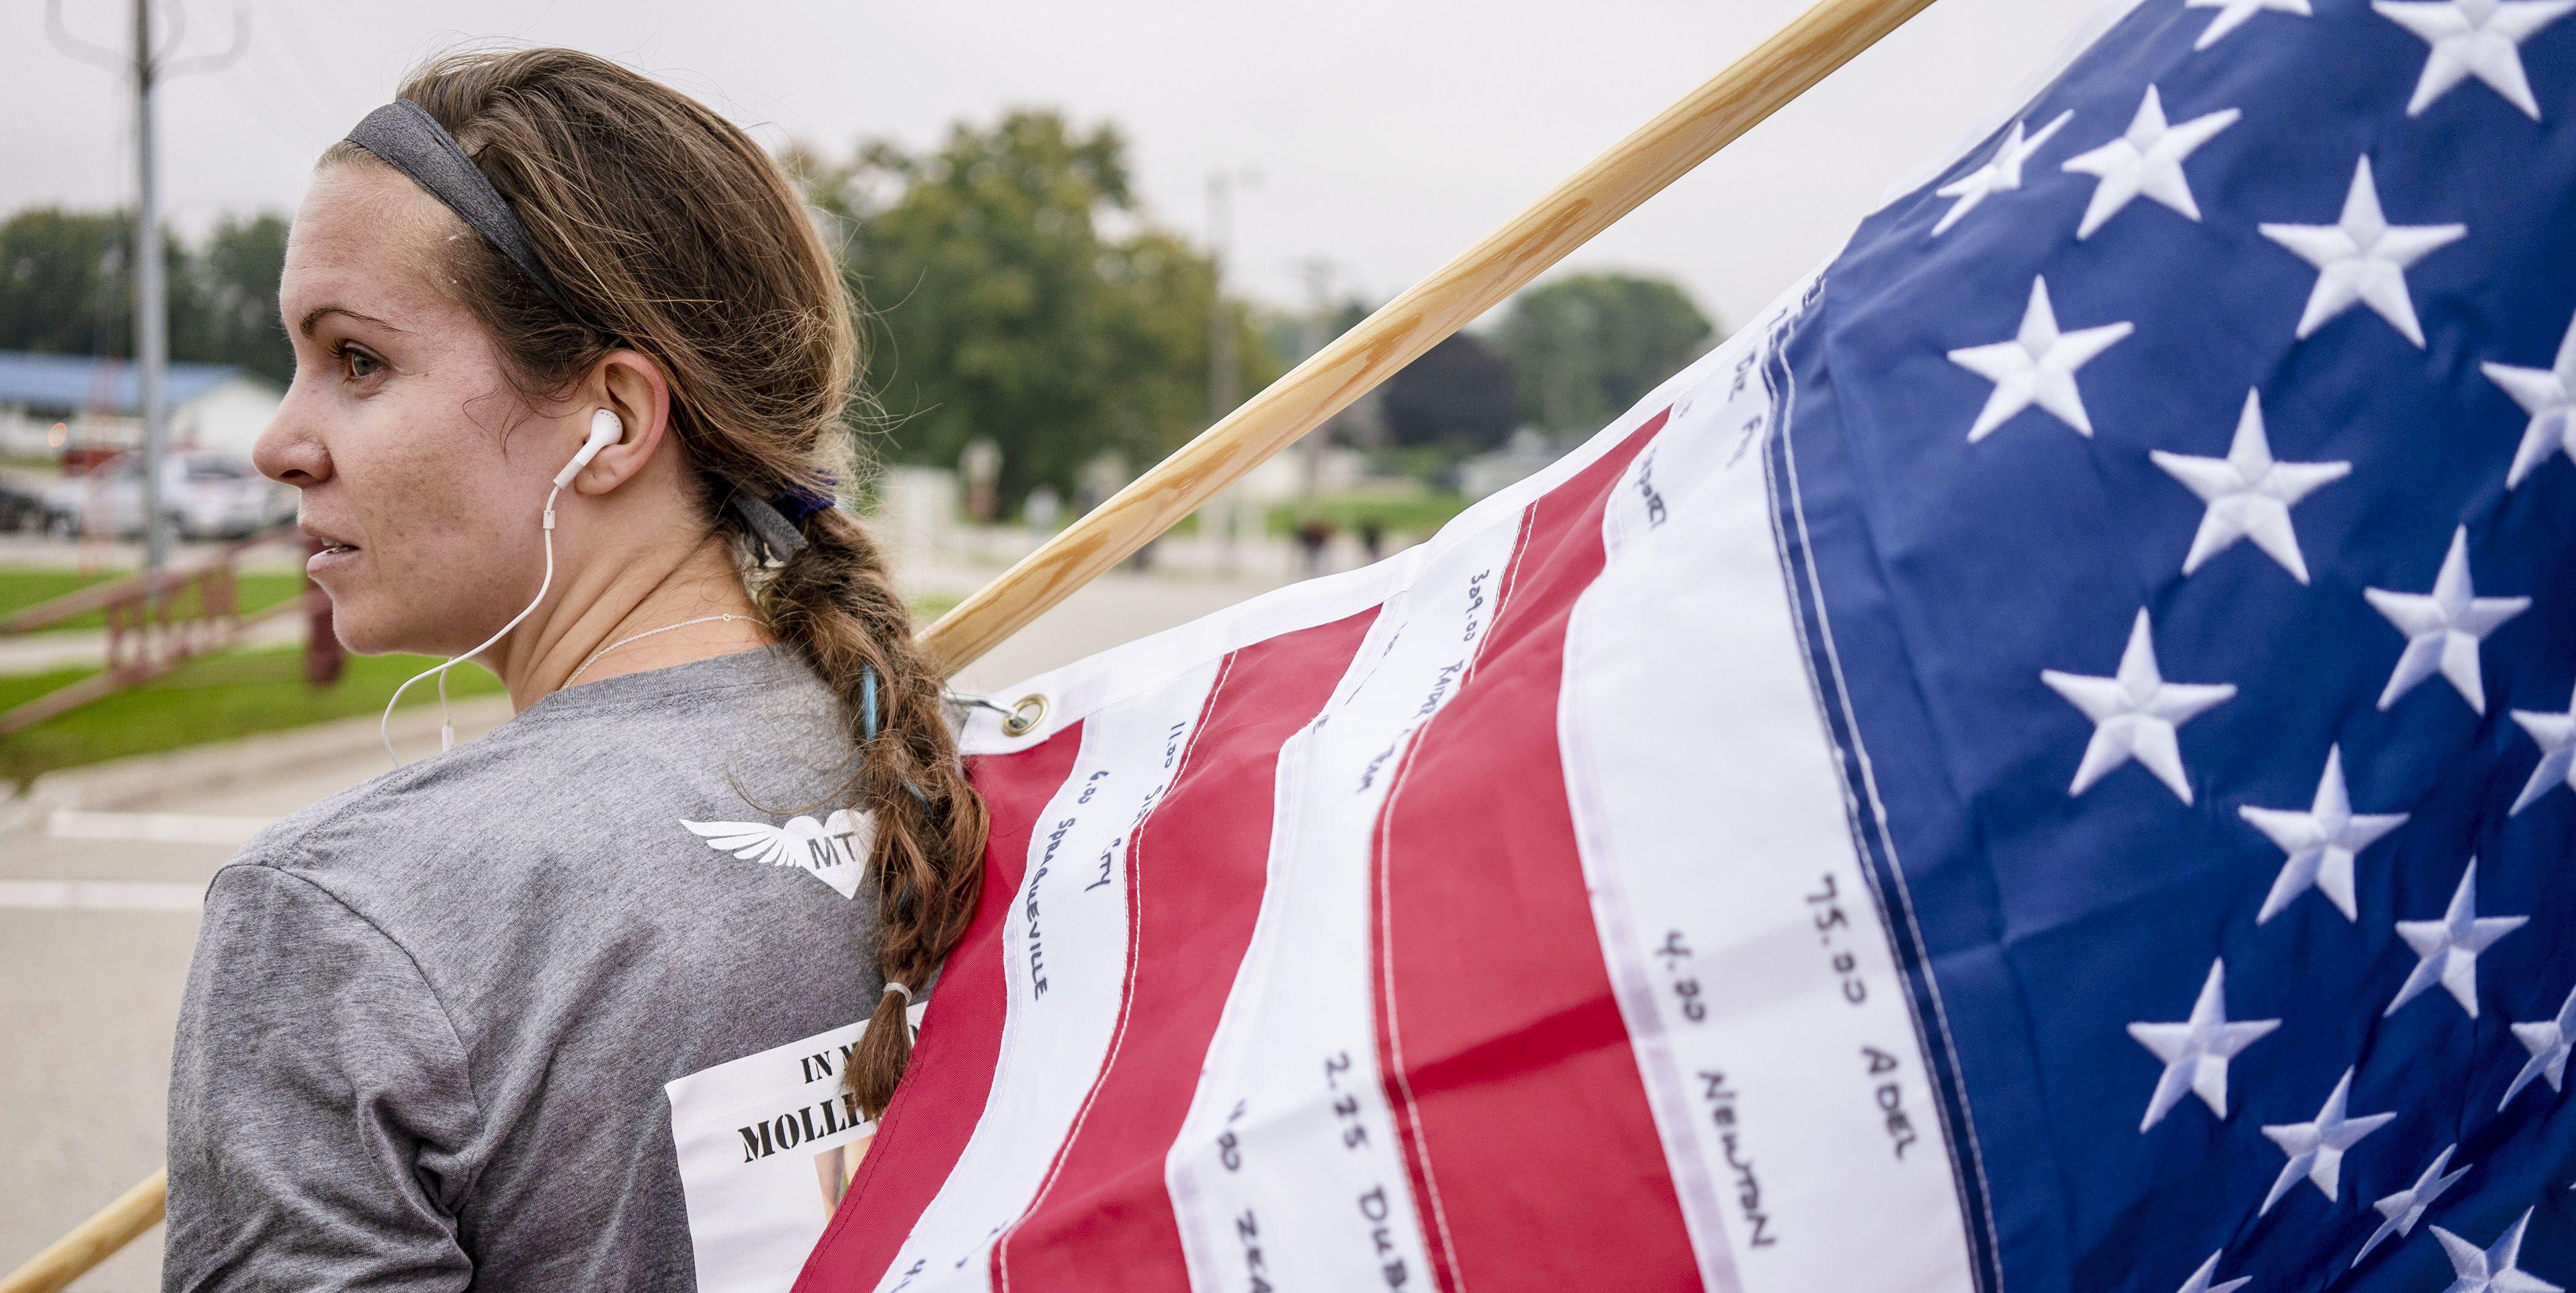 Mollie Tibbetts Memorial Run in Brooklyn, Iowa